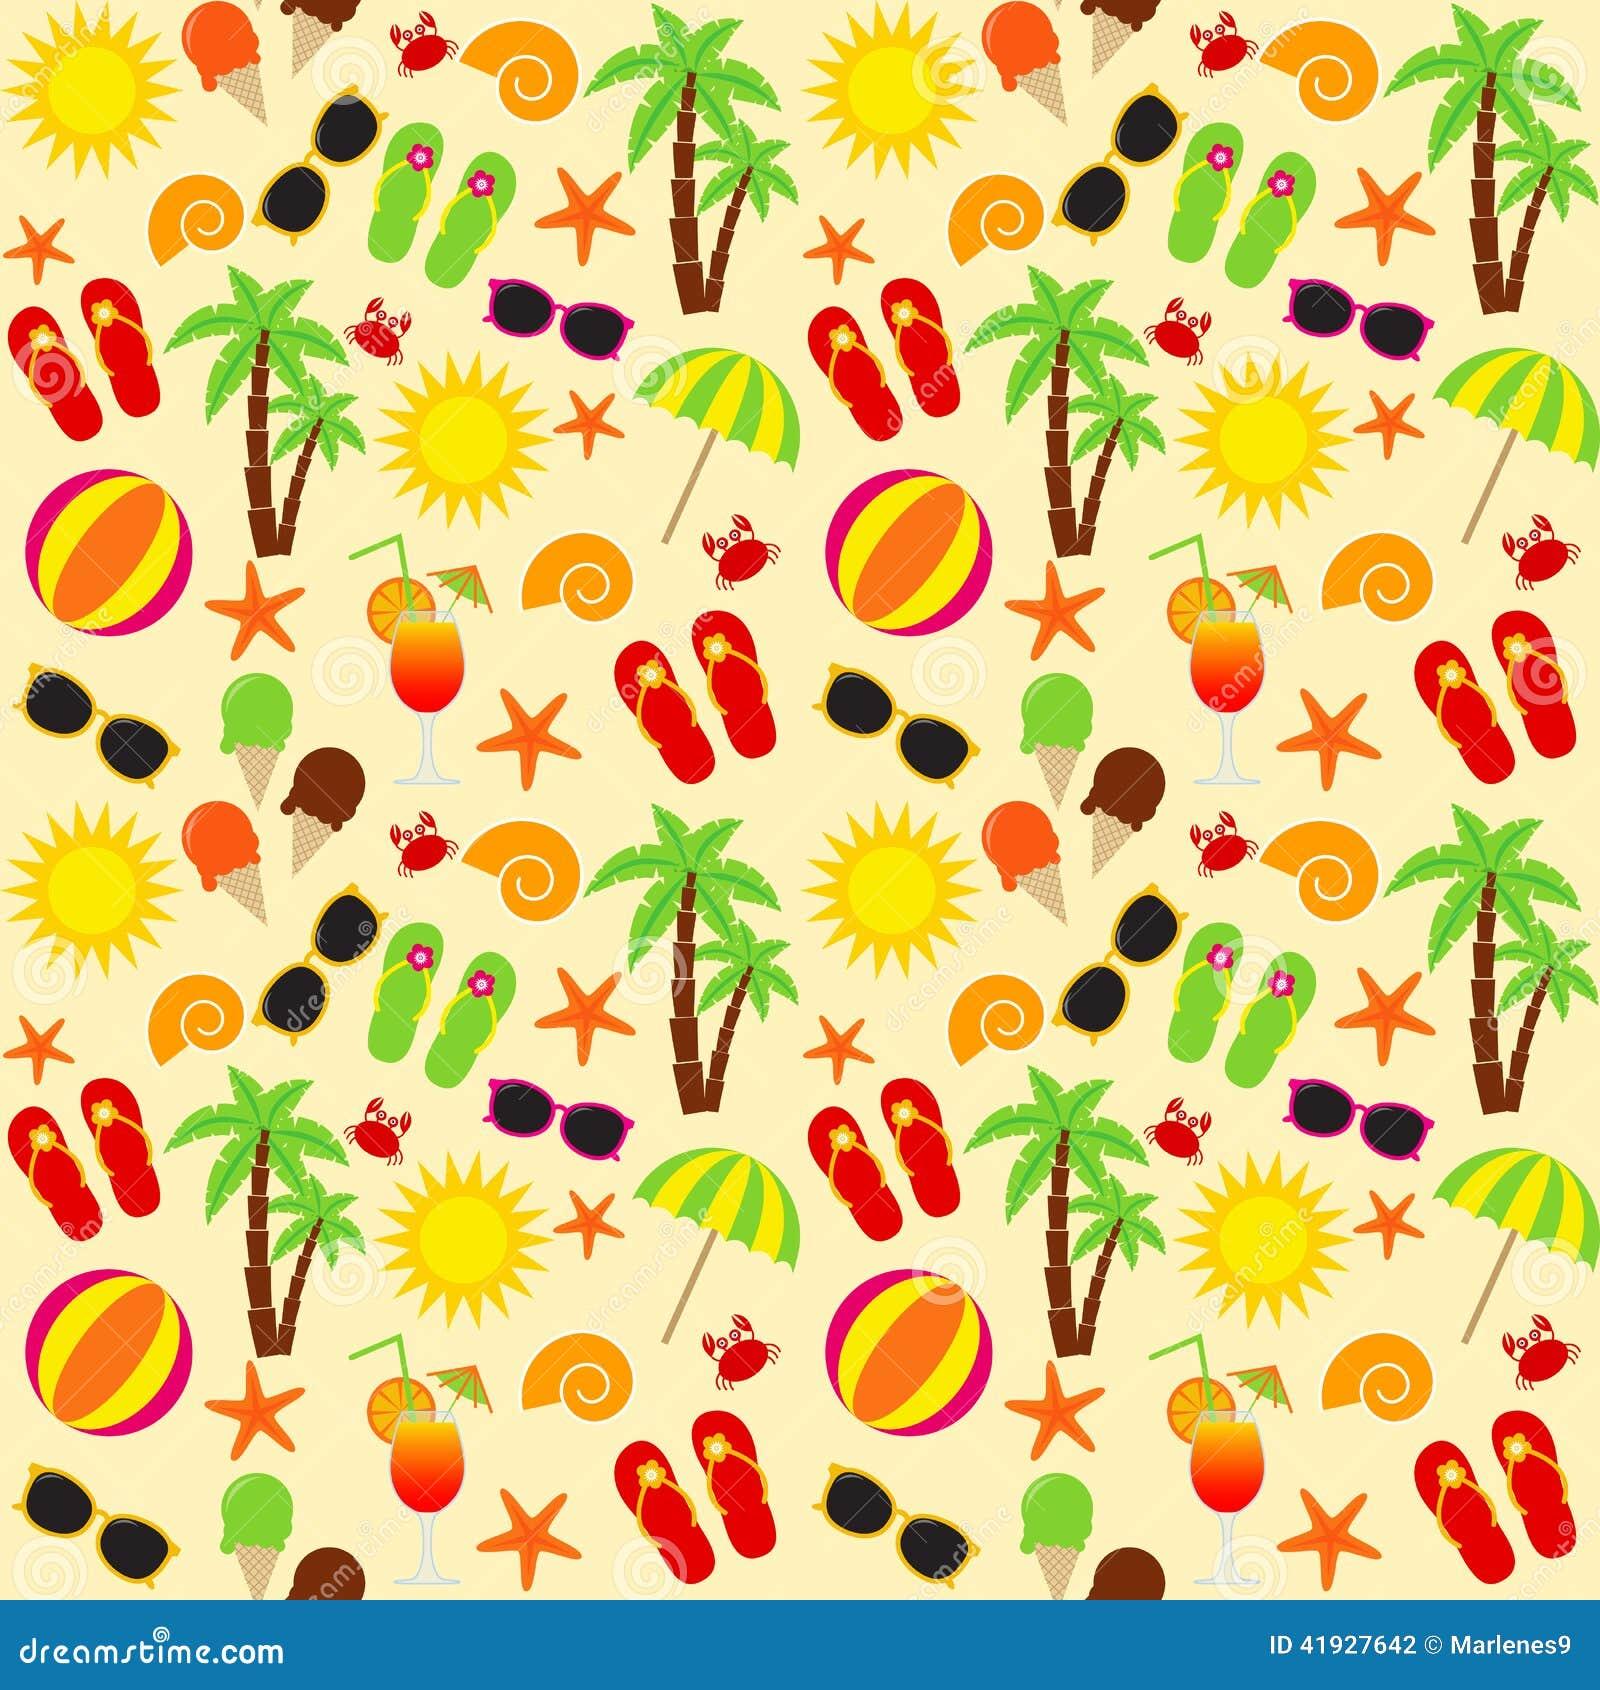 380bcf685f242 Beach seamless pattern stock vector. Illustration of starfish - 41927642